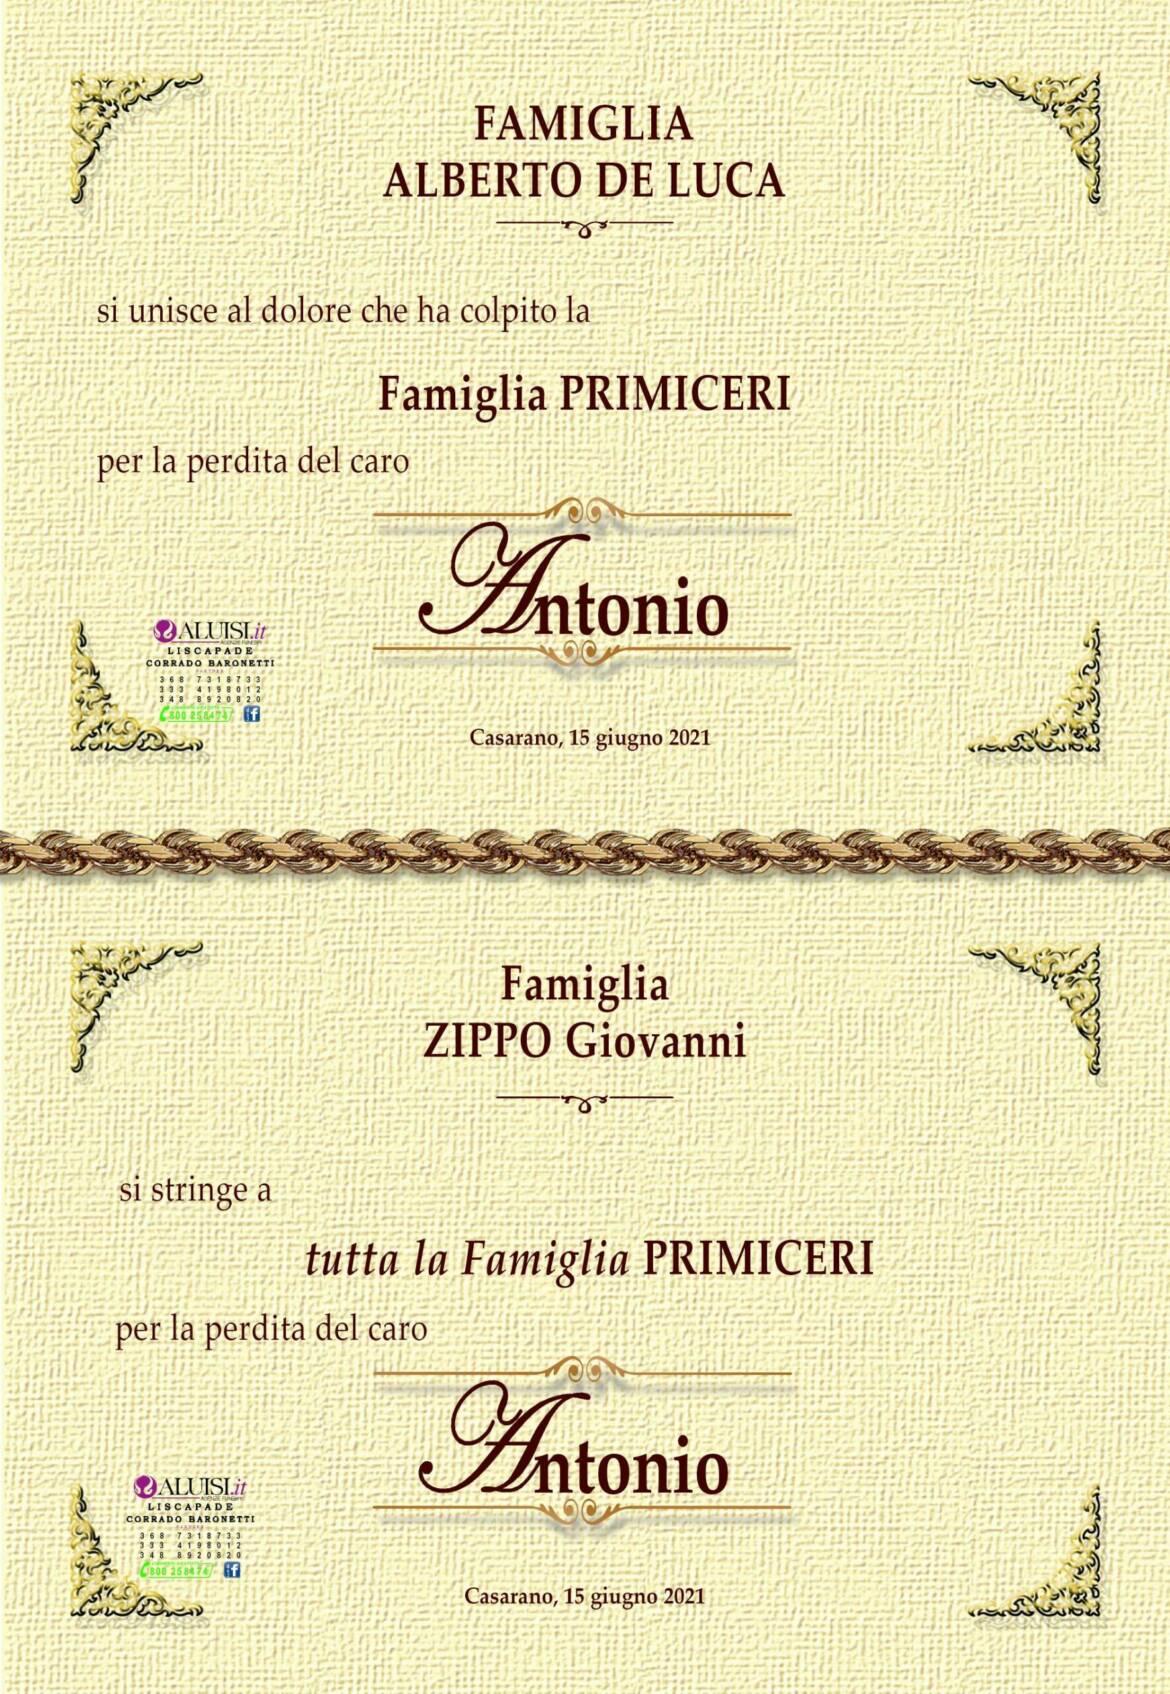 PARTECIPAZIONIe-antonio-casarano-3-scaled.jpg